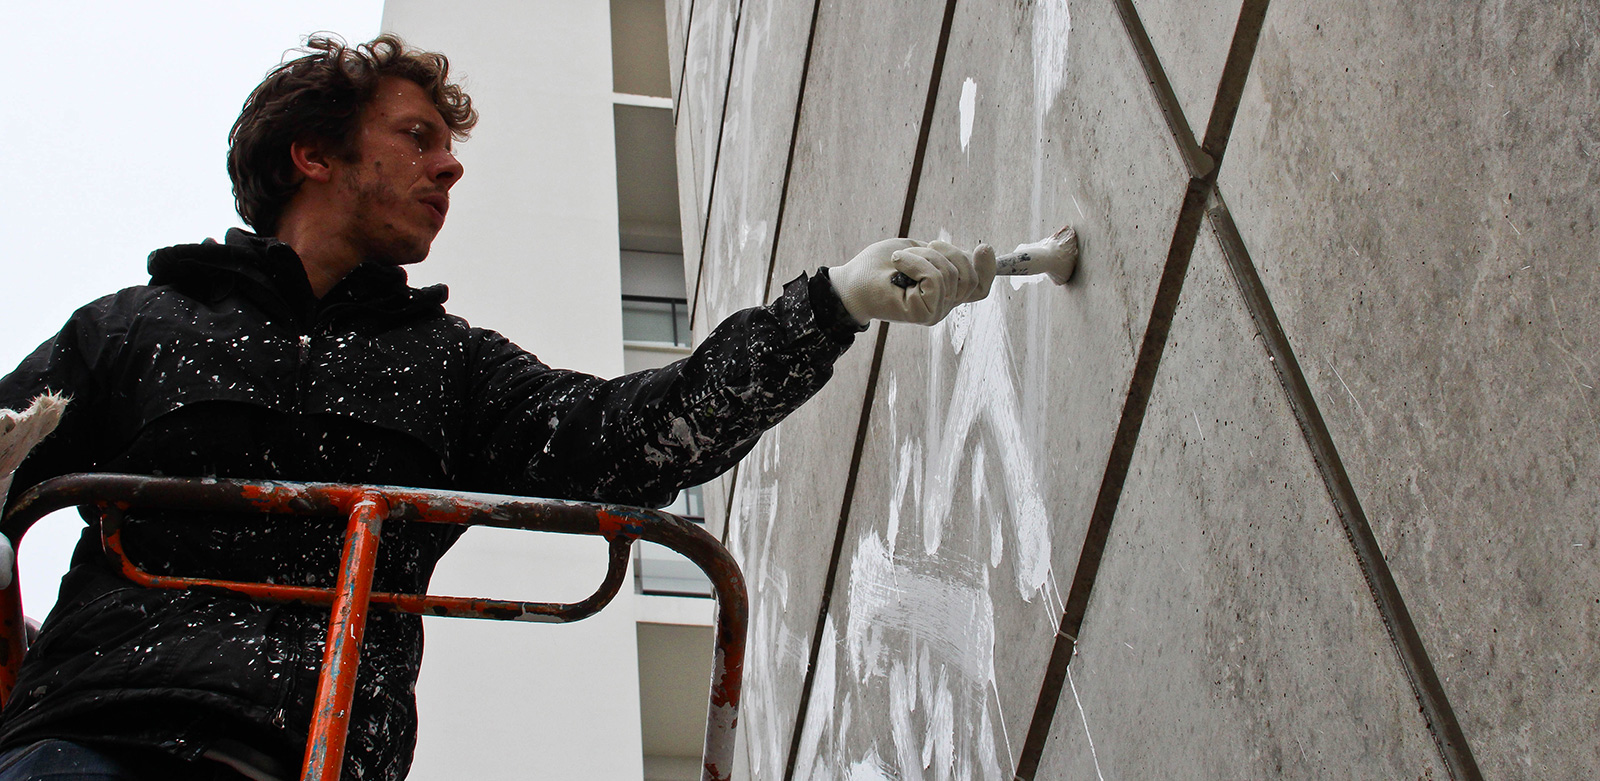 Lek-Sowat-DMV-da-mental-vaporz-graffiti-soldart-montana-bombe-spray-evry-paris-mur-peinture-nicolas-gzeley-10